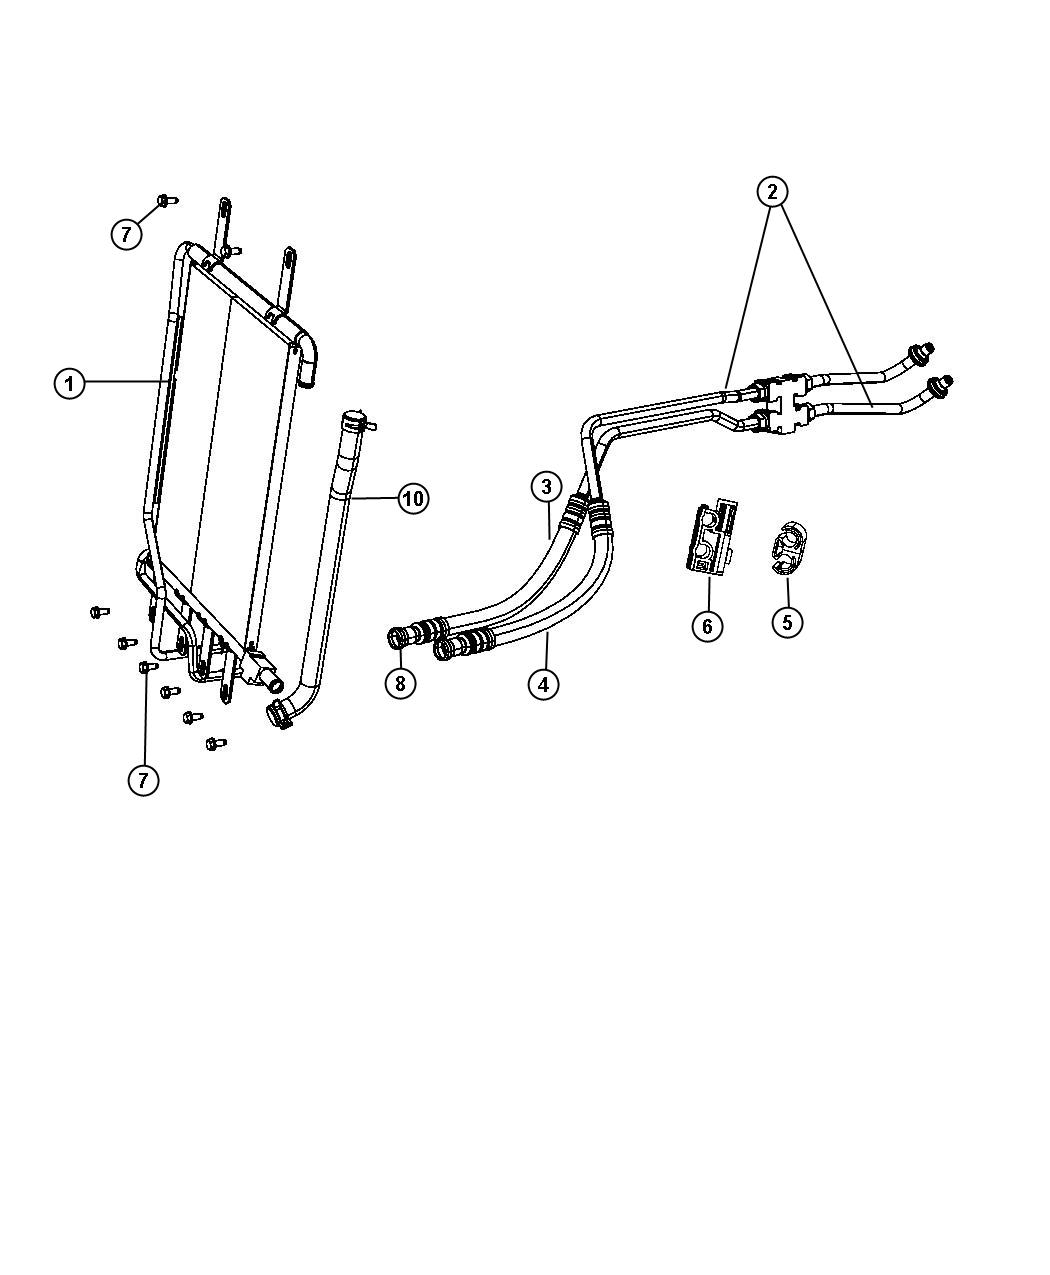 dodge durango used for  tube and hose  oil cooler  return  oil cooler to radiator